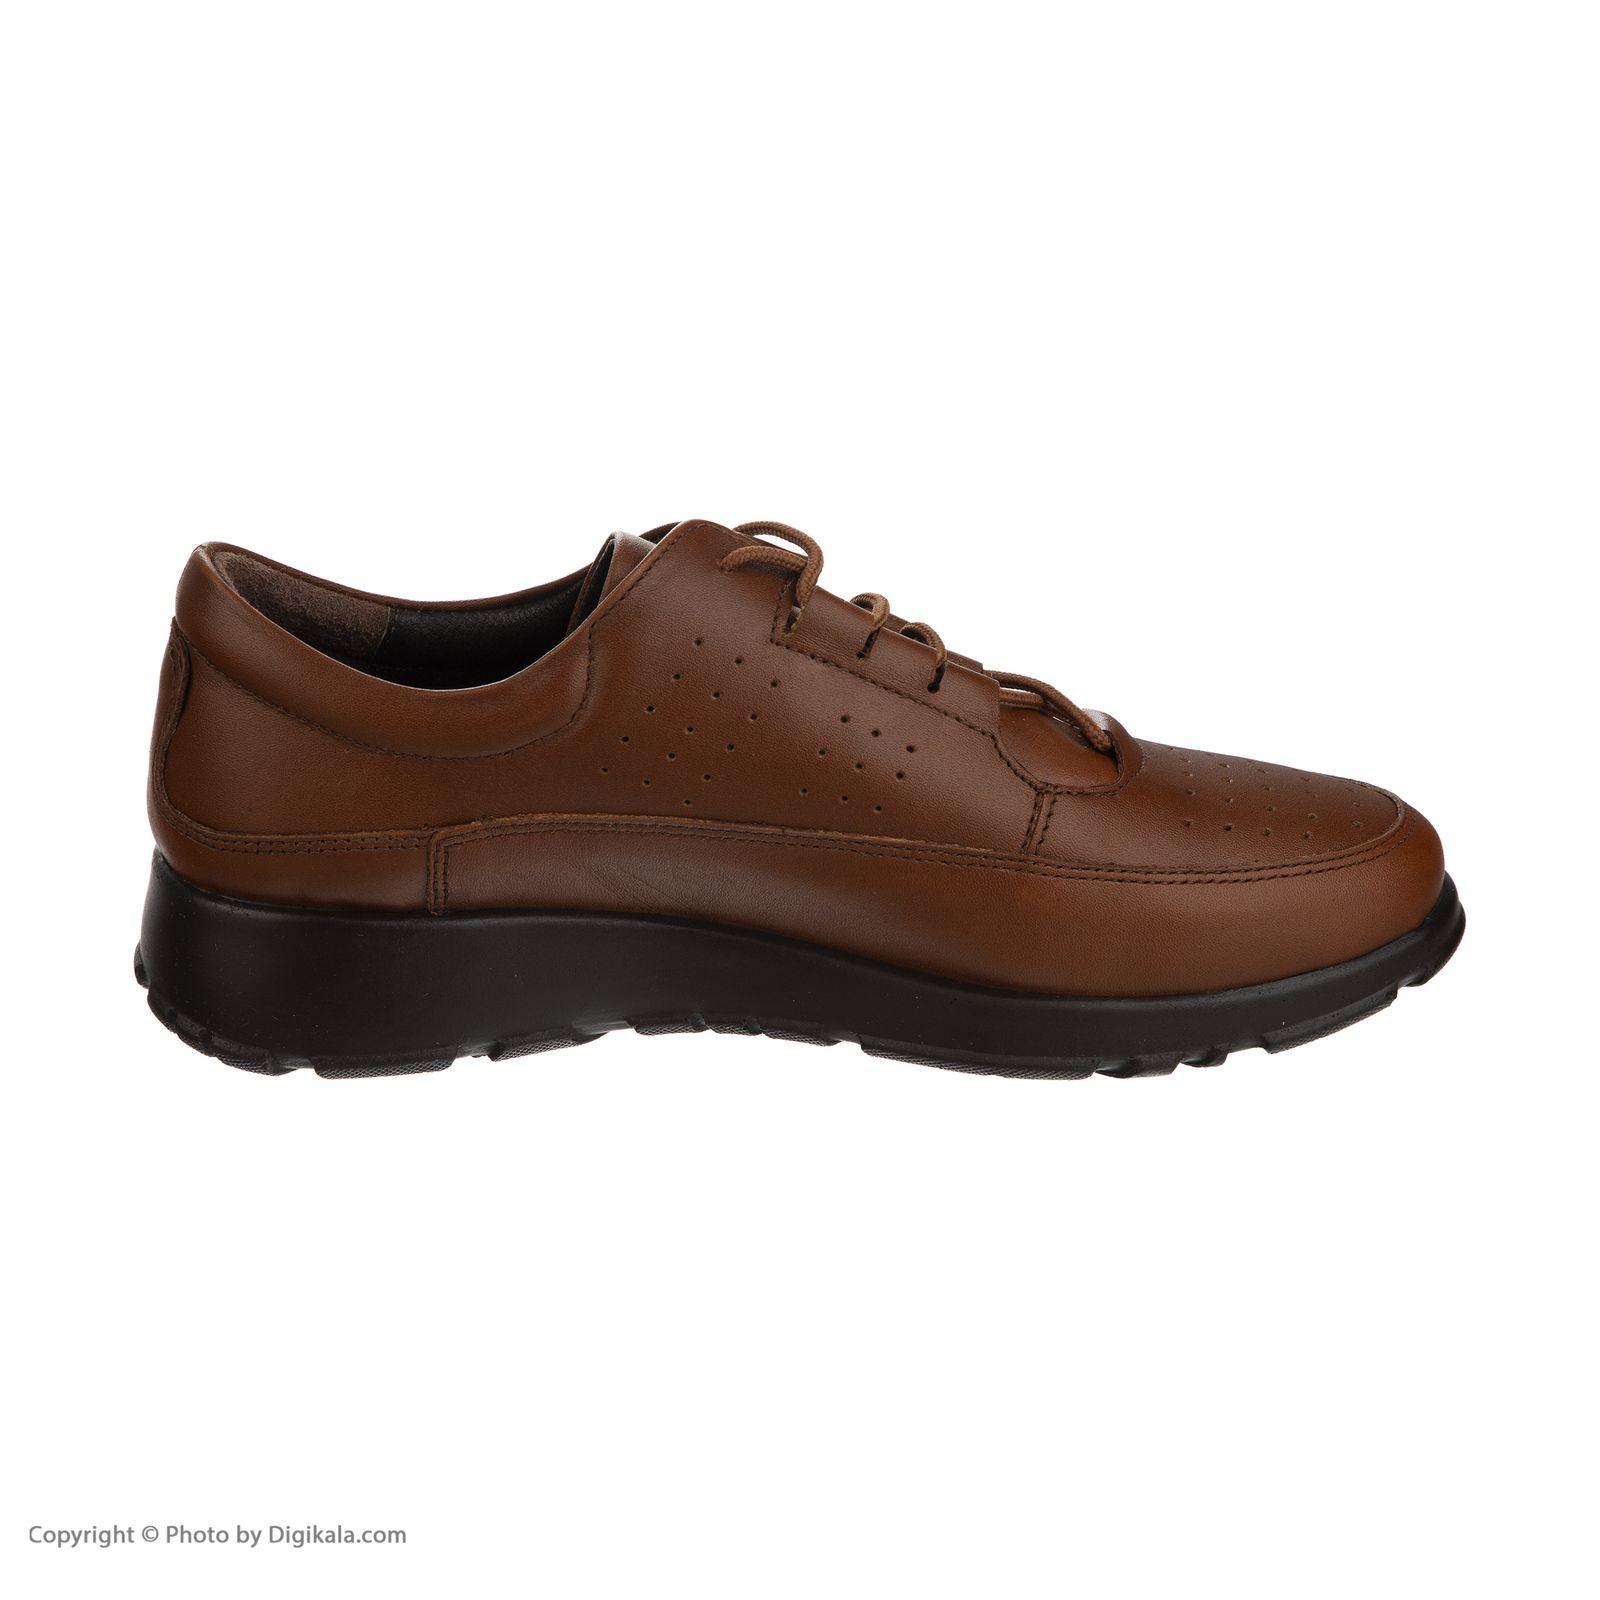 کفش روزمره زنانه شیفر مدل 5289A500136 -  - 7